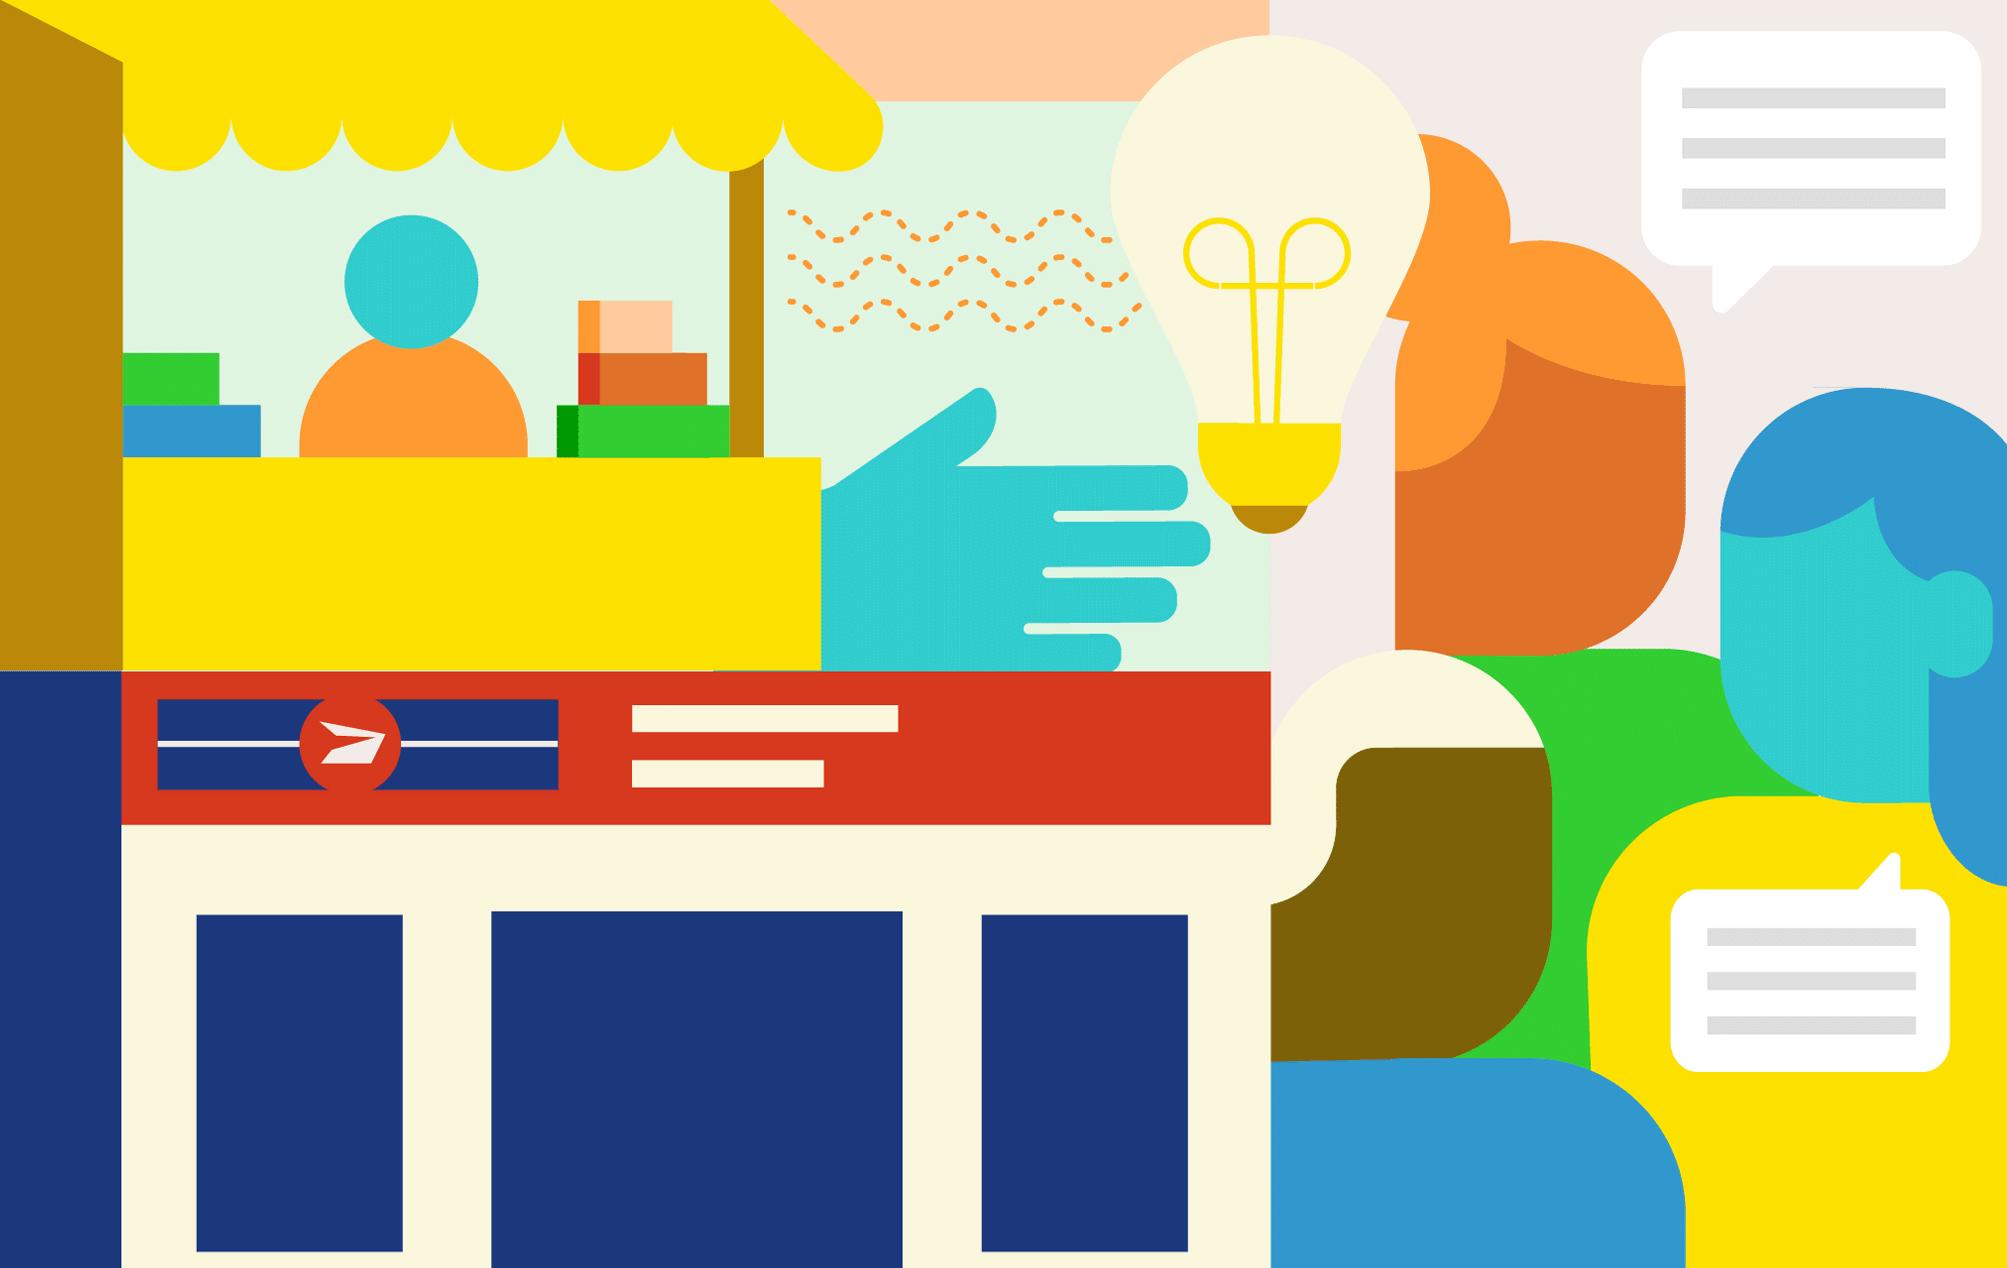 Composite illustration of a community hub